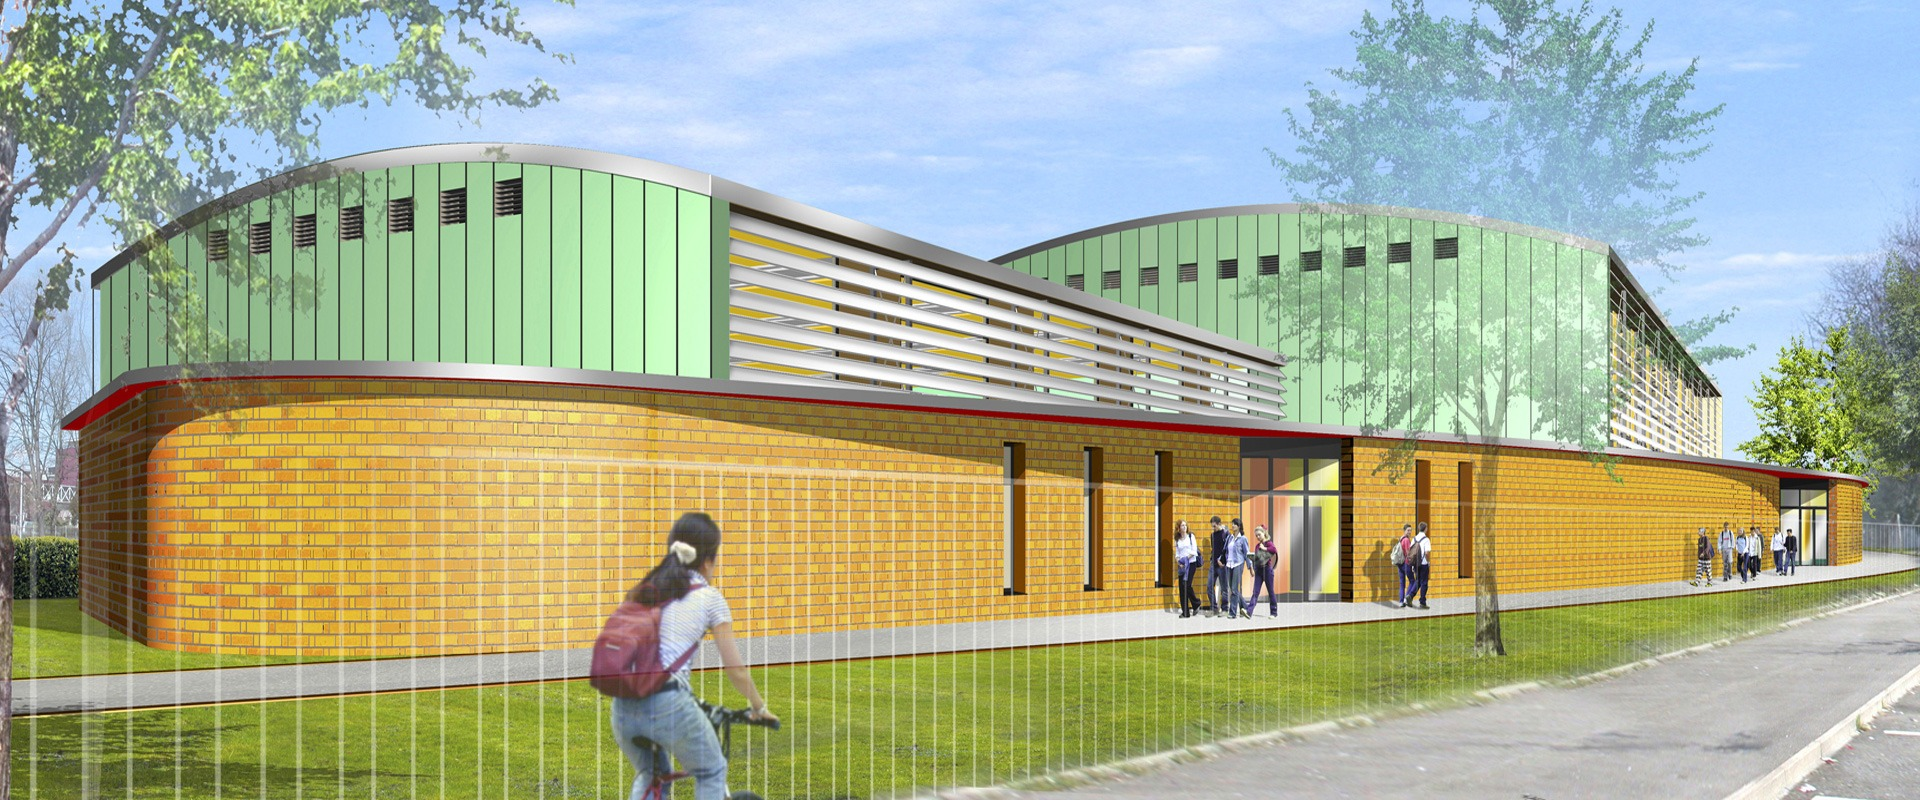 Construction gymnase